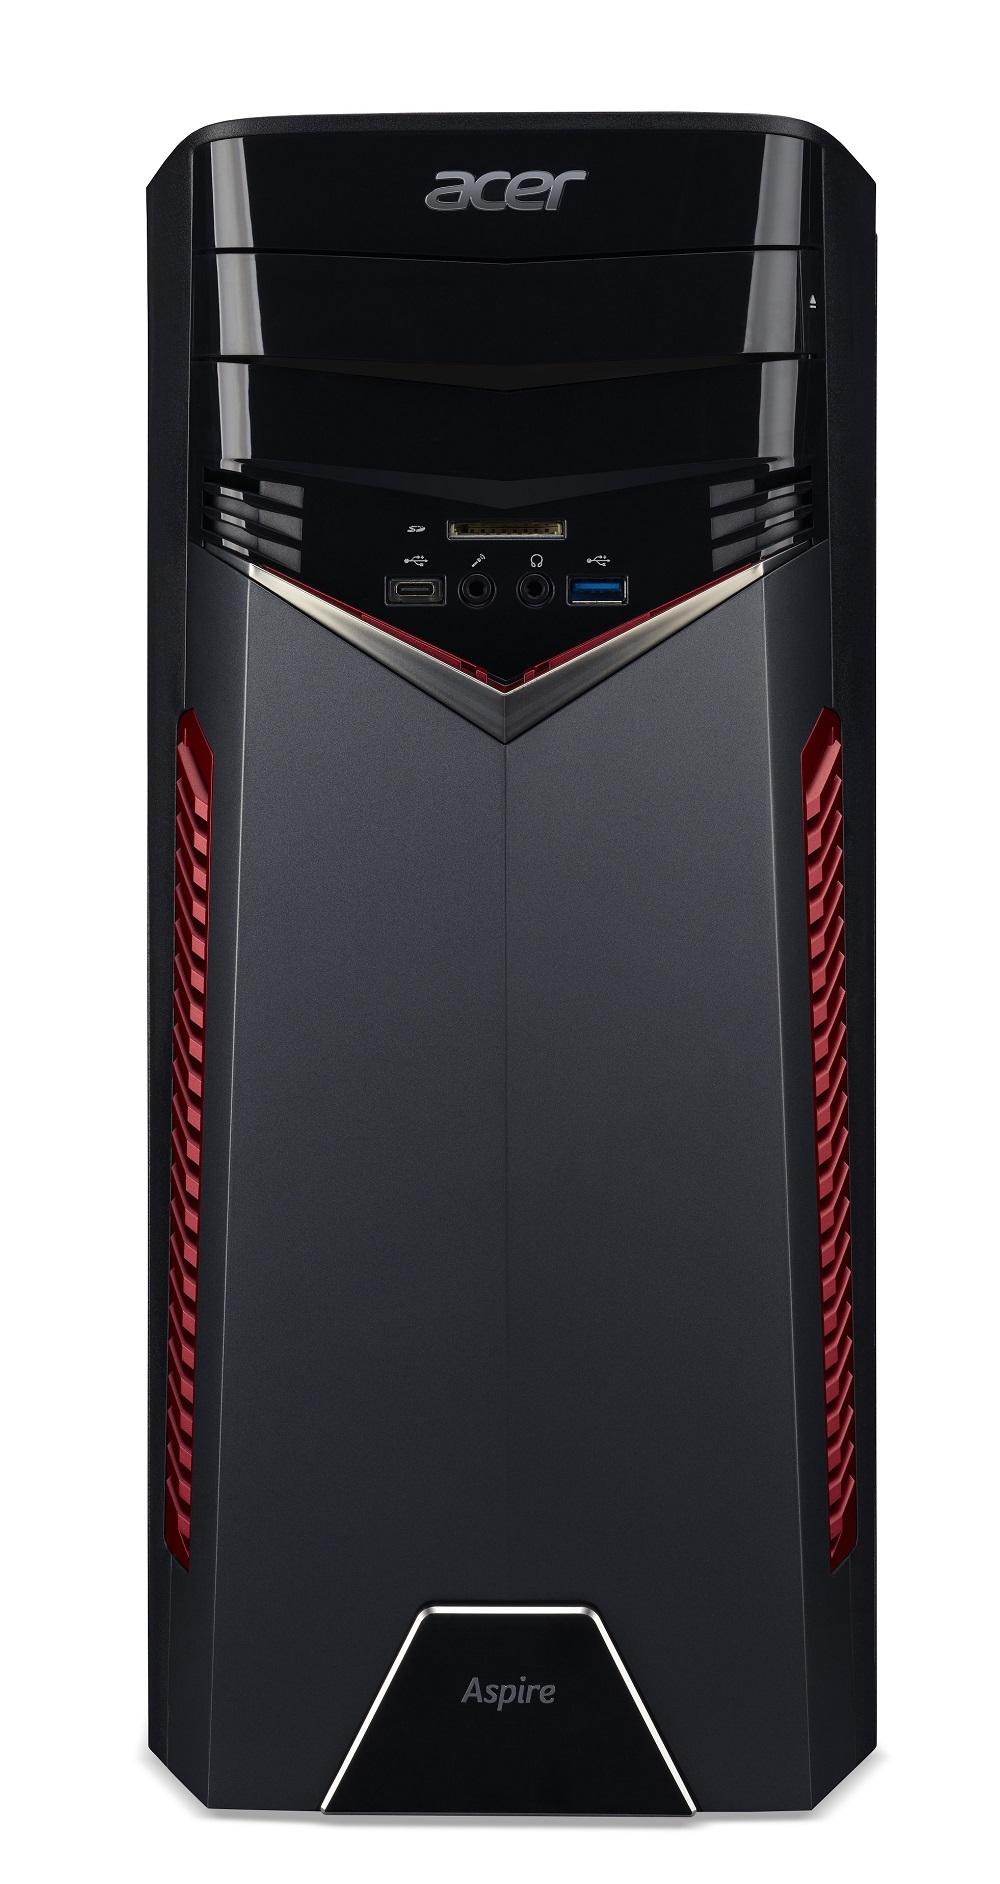 Acer Aspire GX-781 - i5-7400/128SSD+1TB/8G/GTX1060/DVD/W10